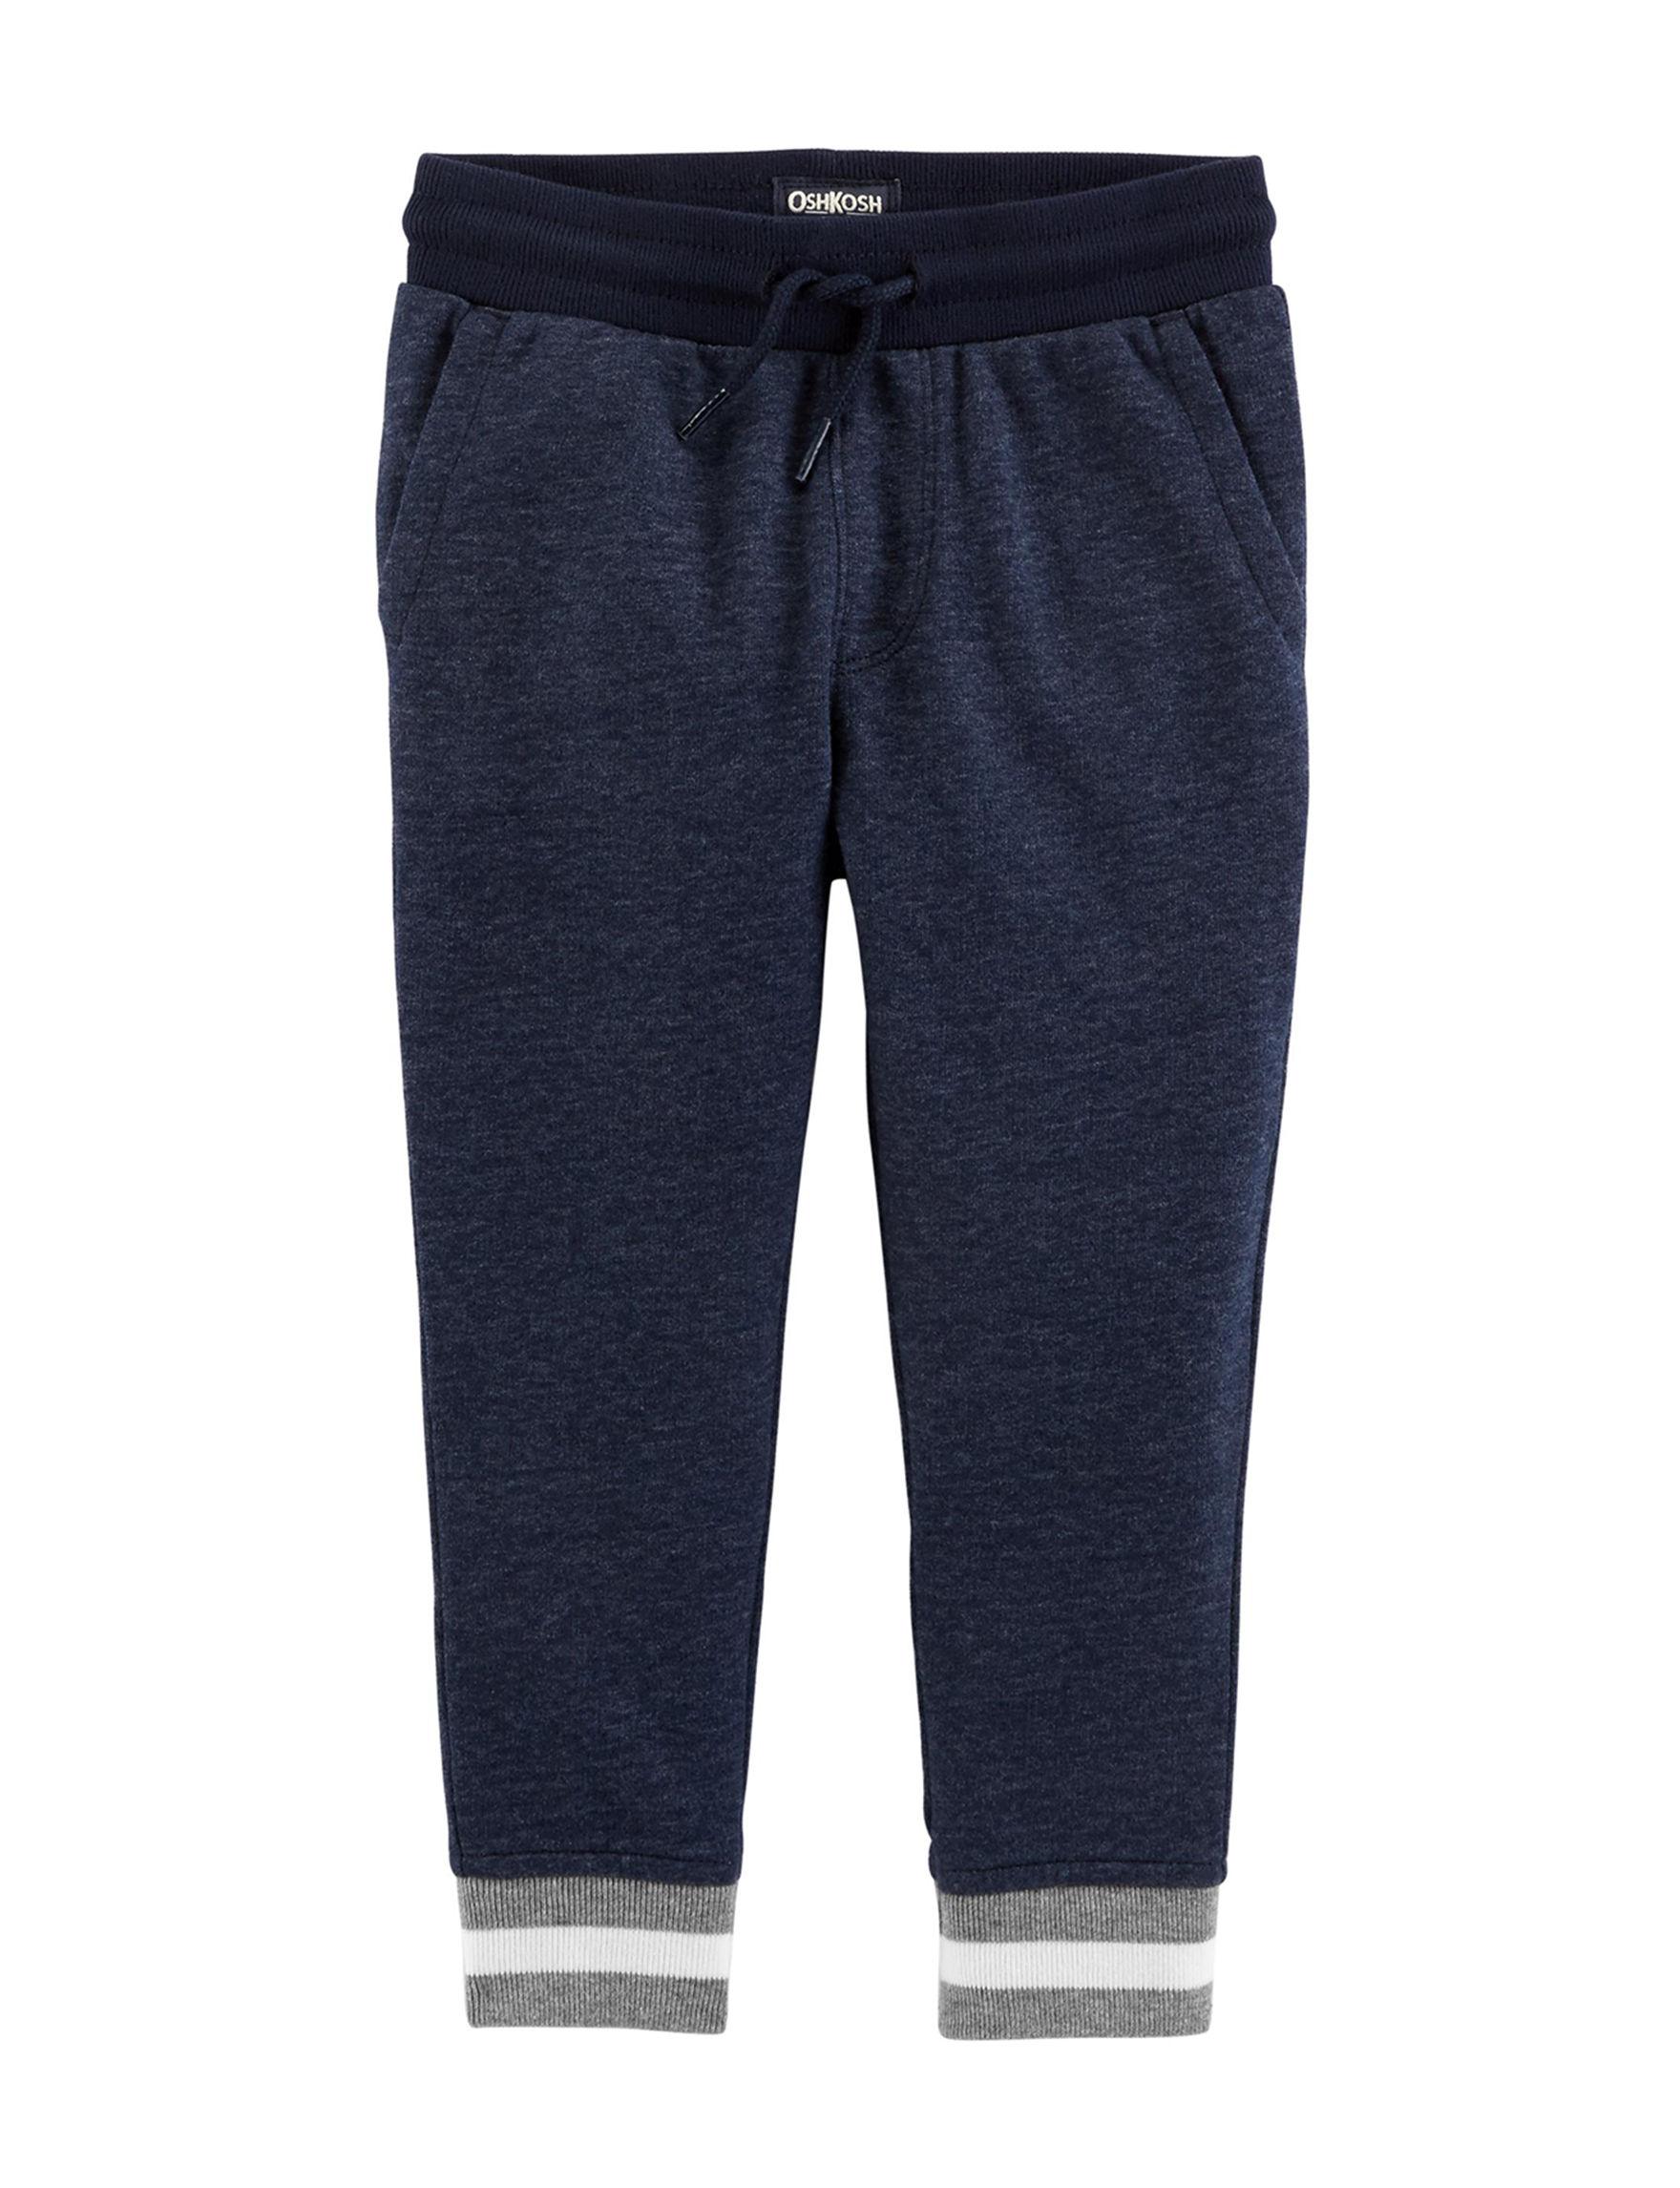 182504aab OshKosh B'gosh Fleece Lined Jogger Pants - Toddler Boys | Stage Stores